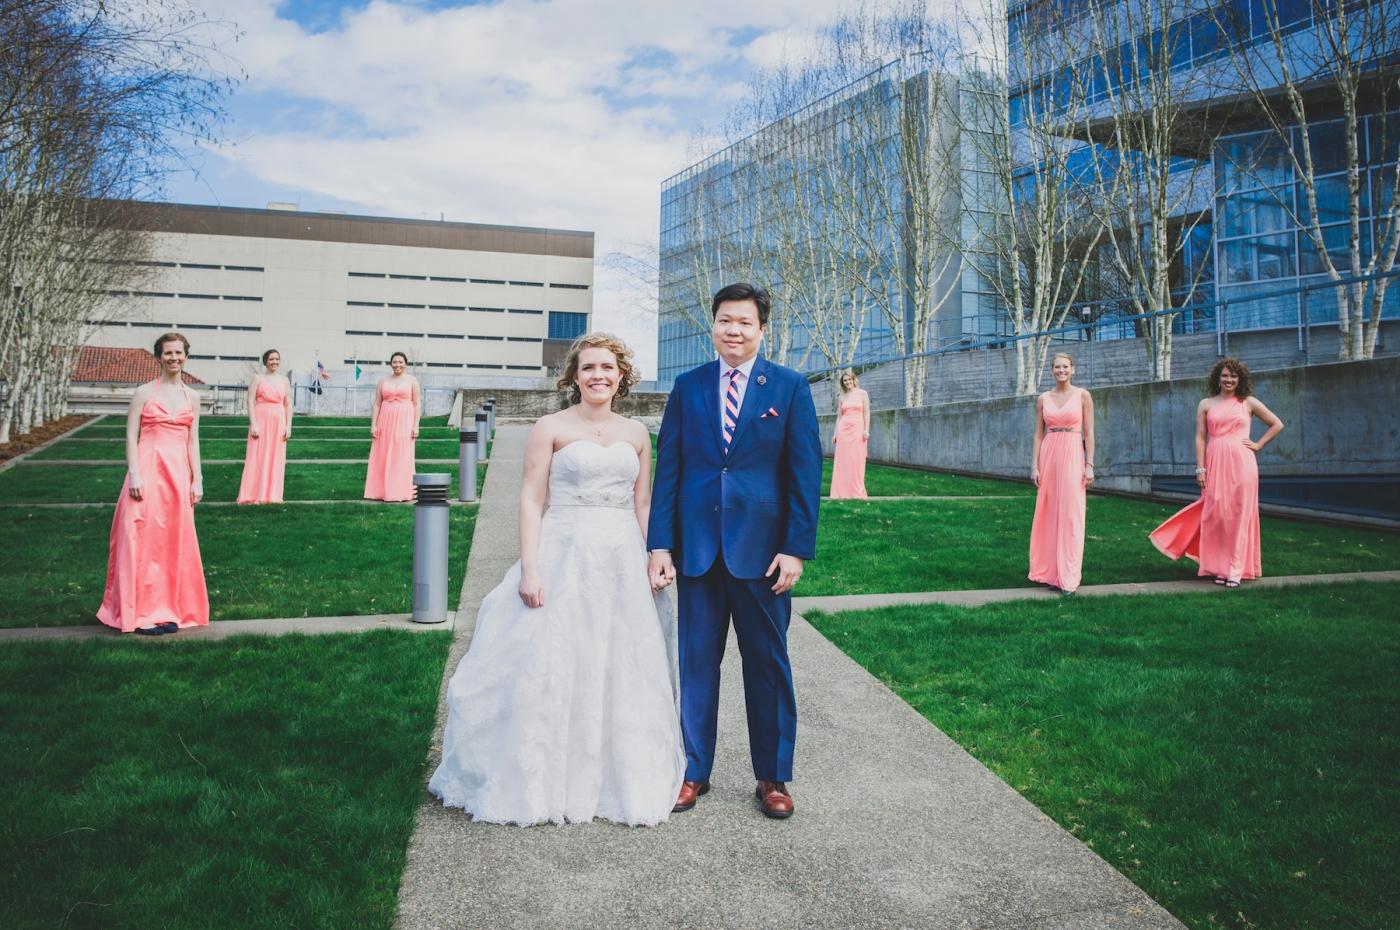 DSC_2281Everett_Wedding_Ballroom_Jane_Speleers_photography_Rachel_and_Edmund_Bridesmaids_peach_dresses_groomsmen_2017